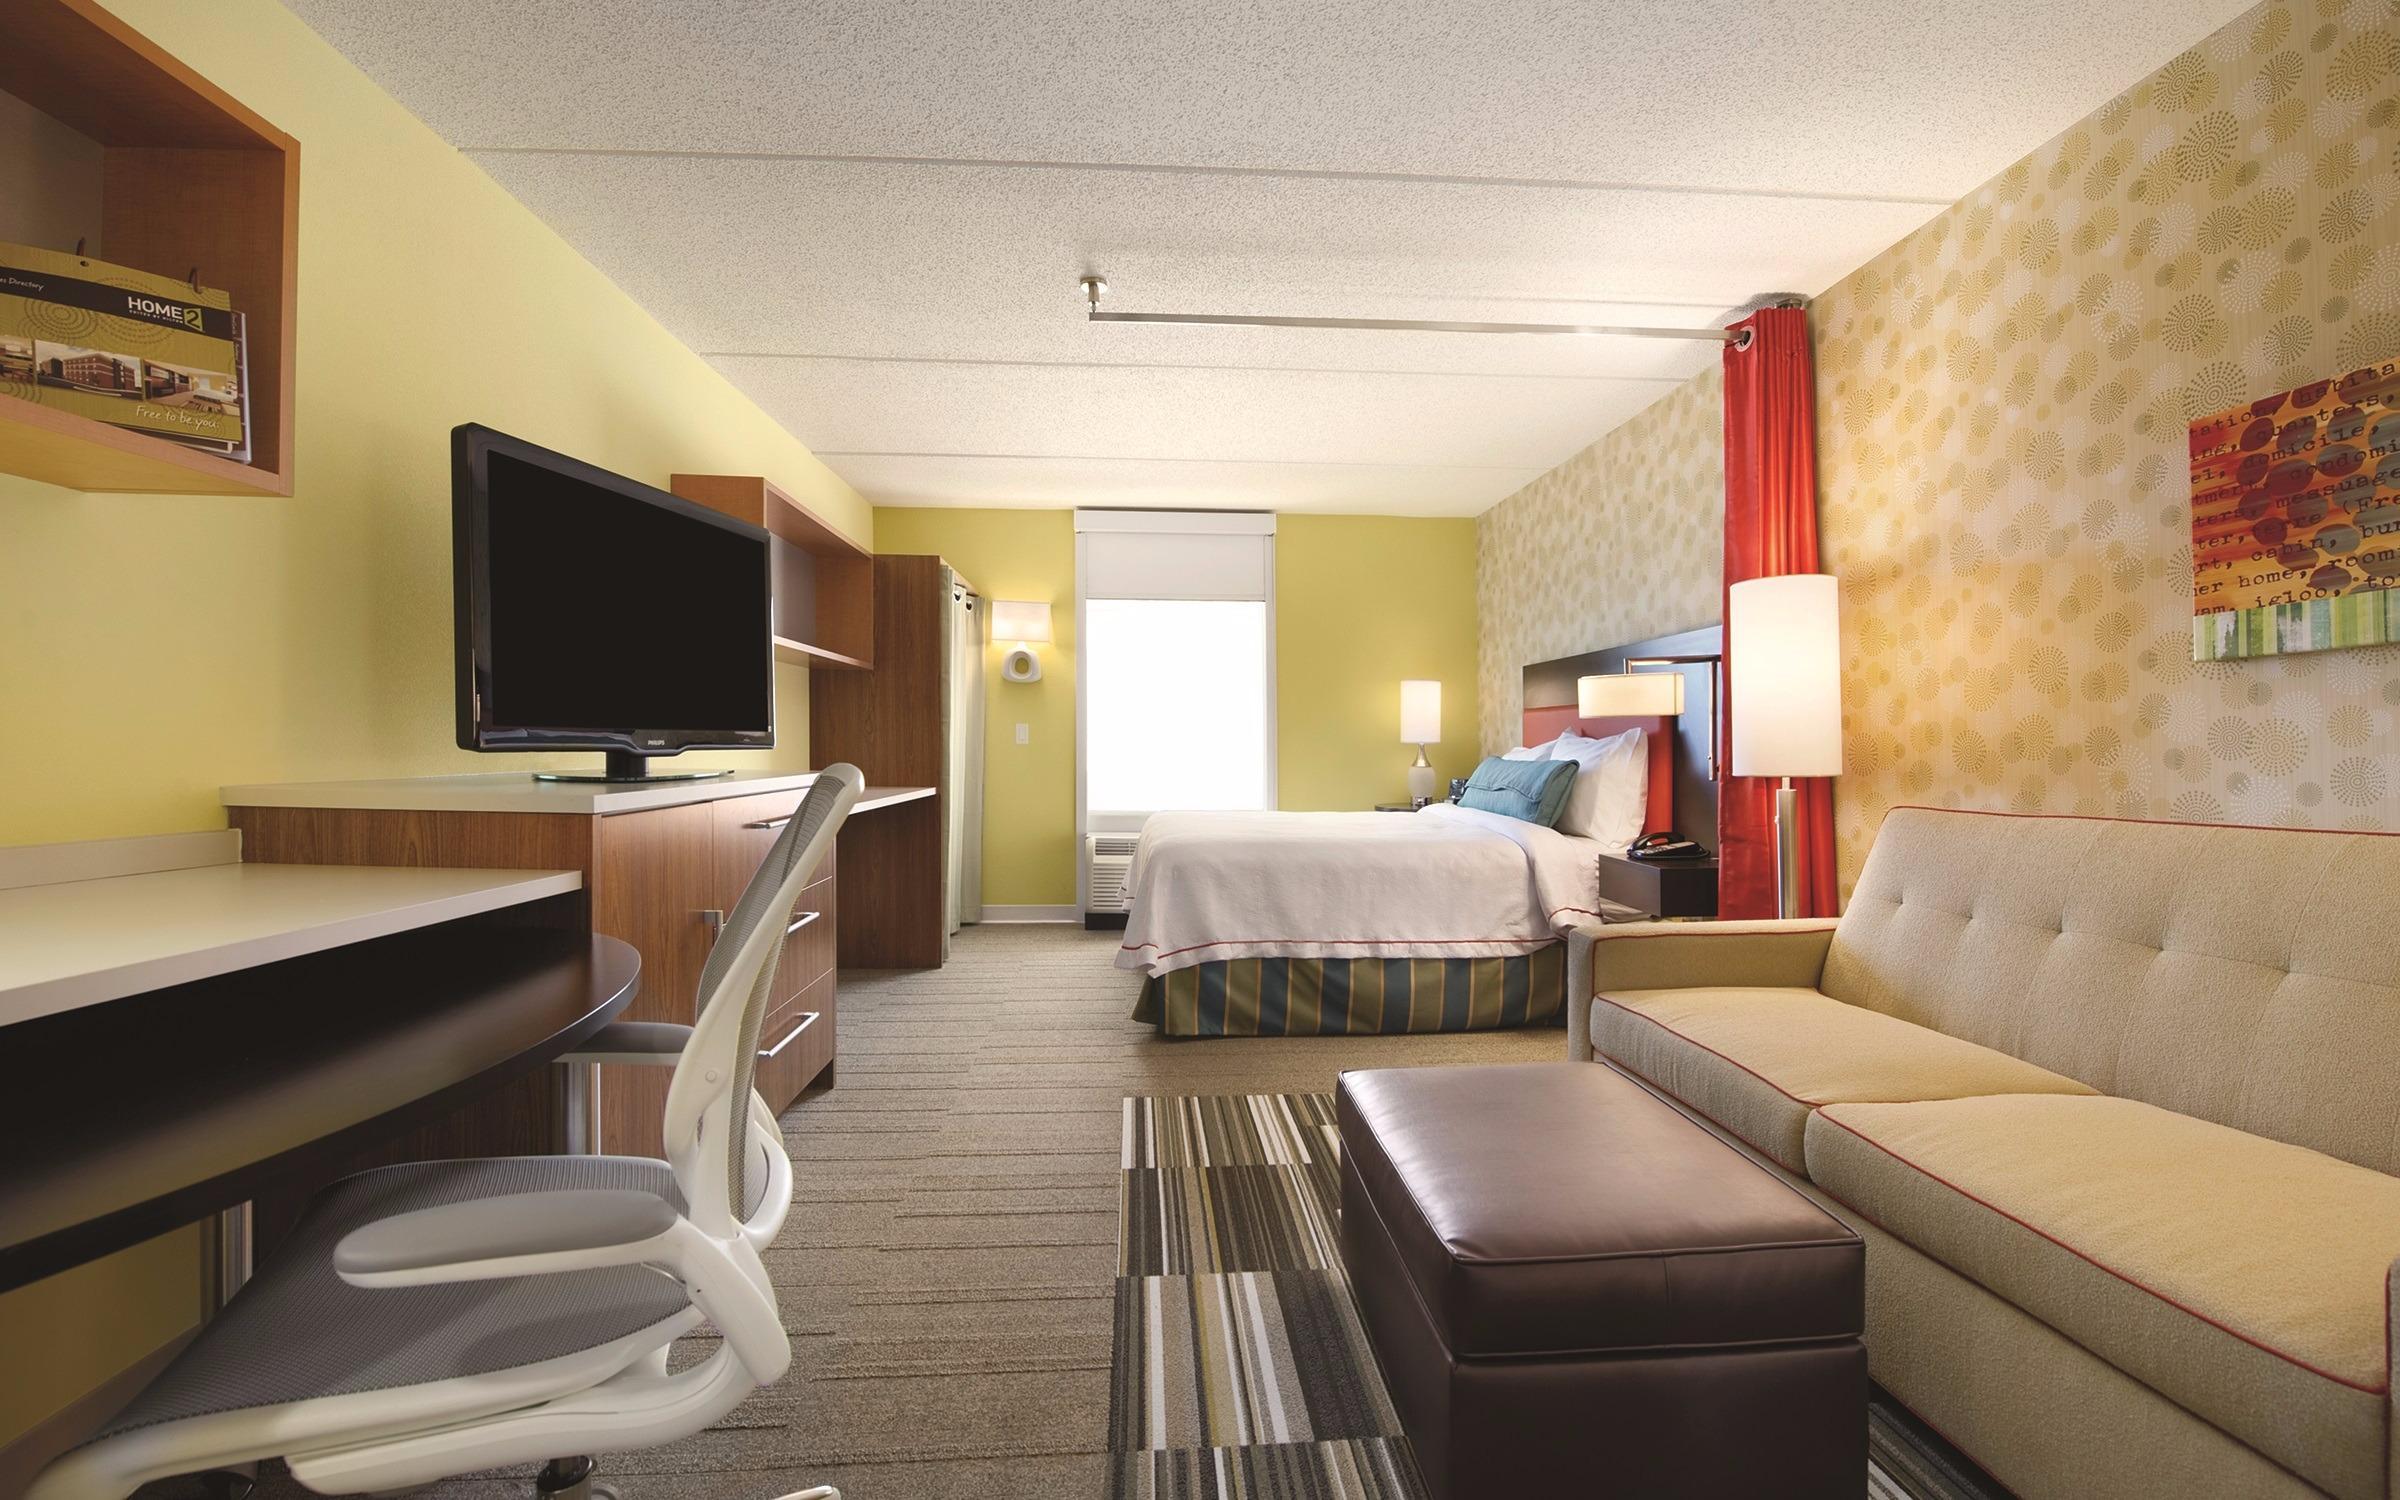 home2 suites by hilton stillwater at 306 e hall of fame. Black Bedroom Furniture Sets. Home Design Ideas